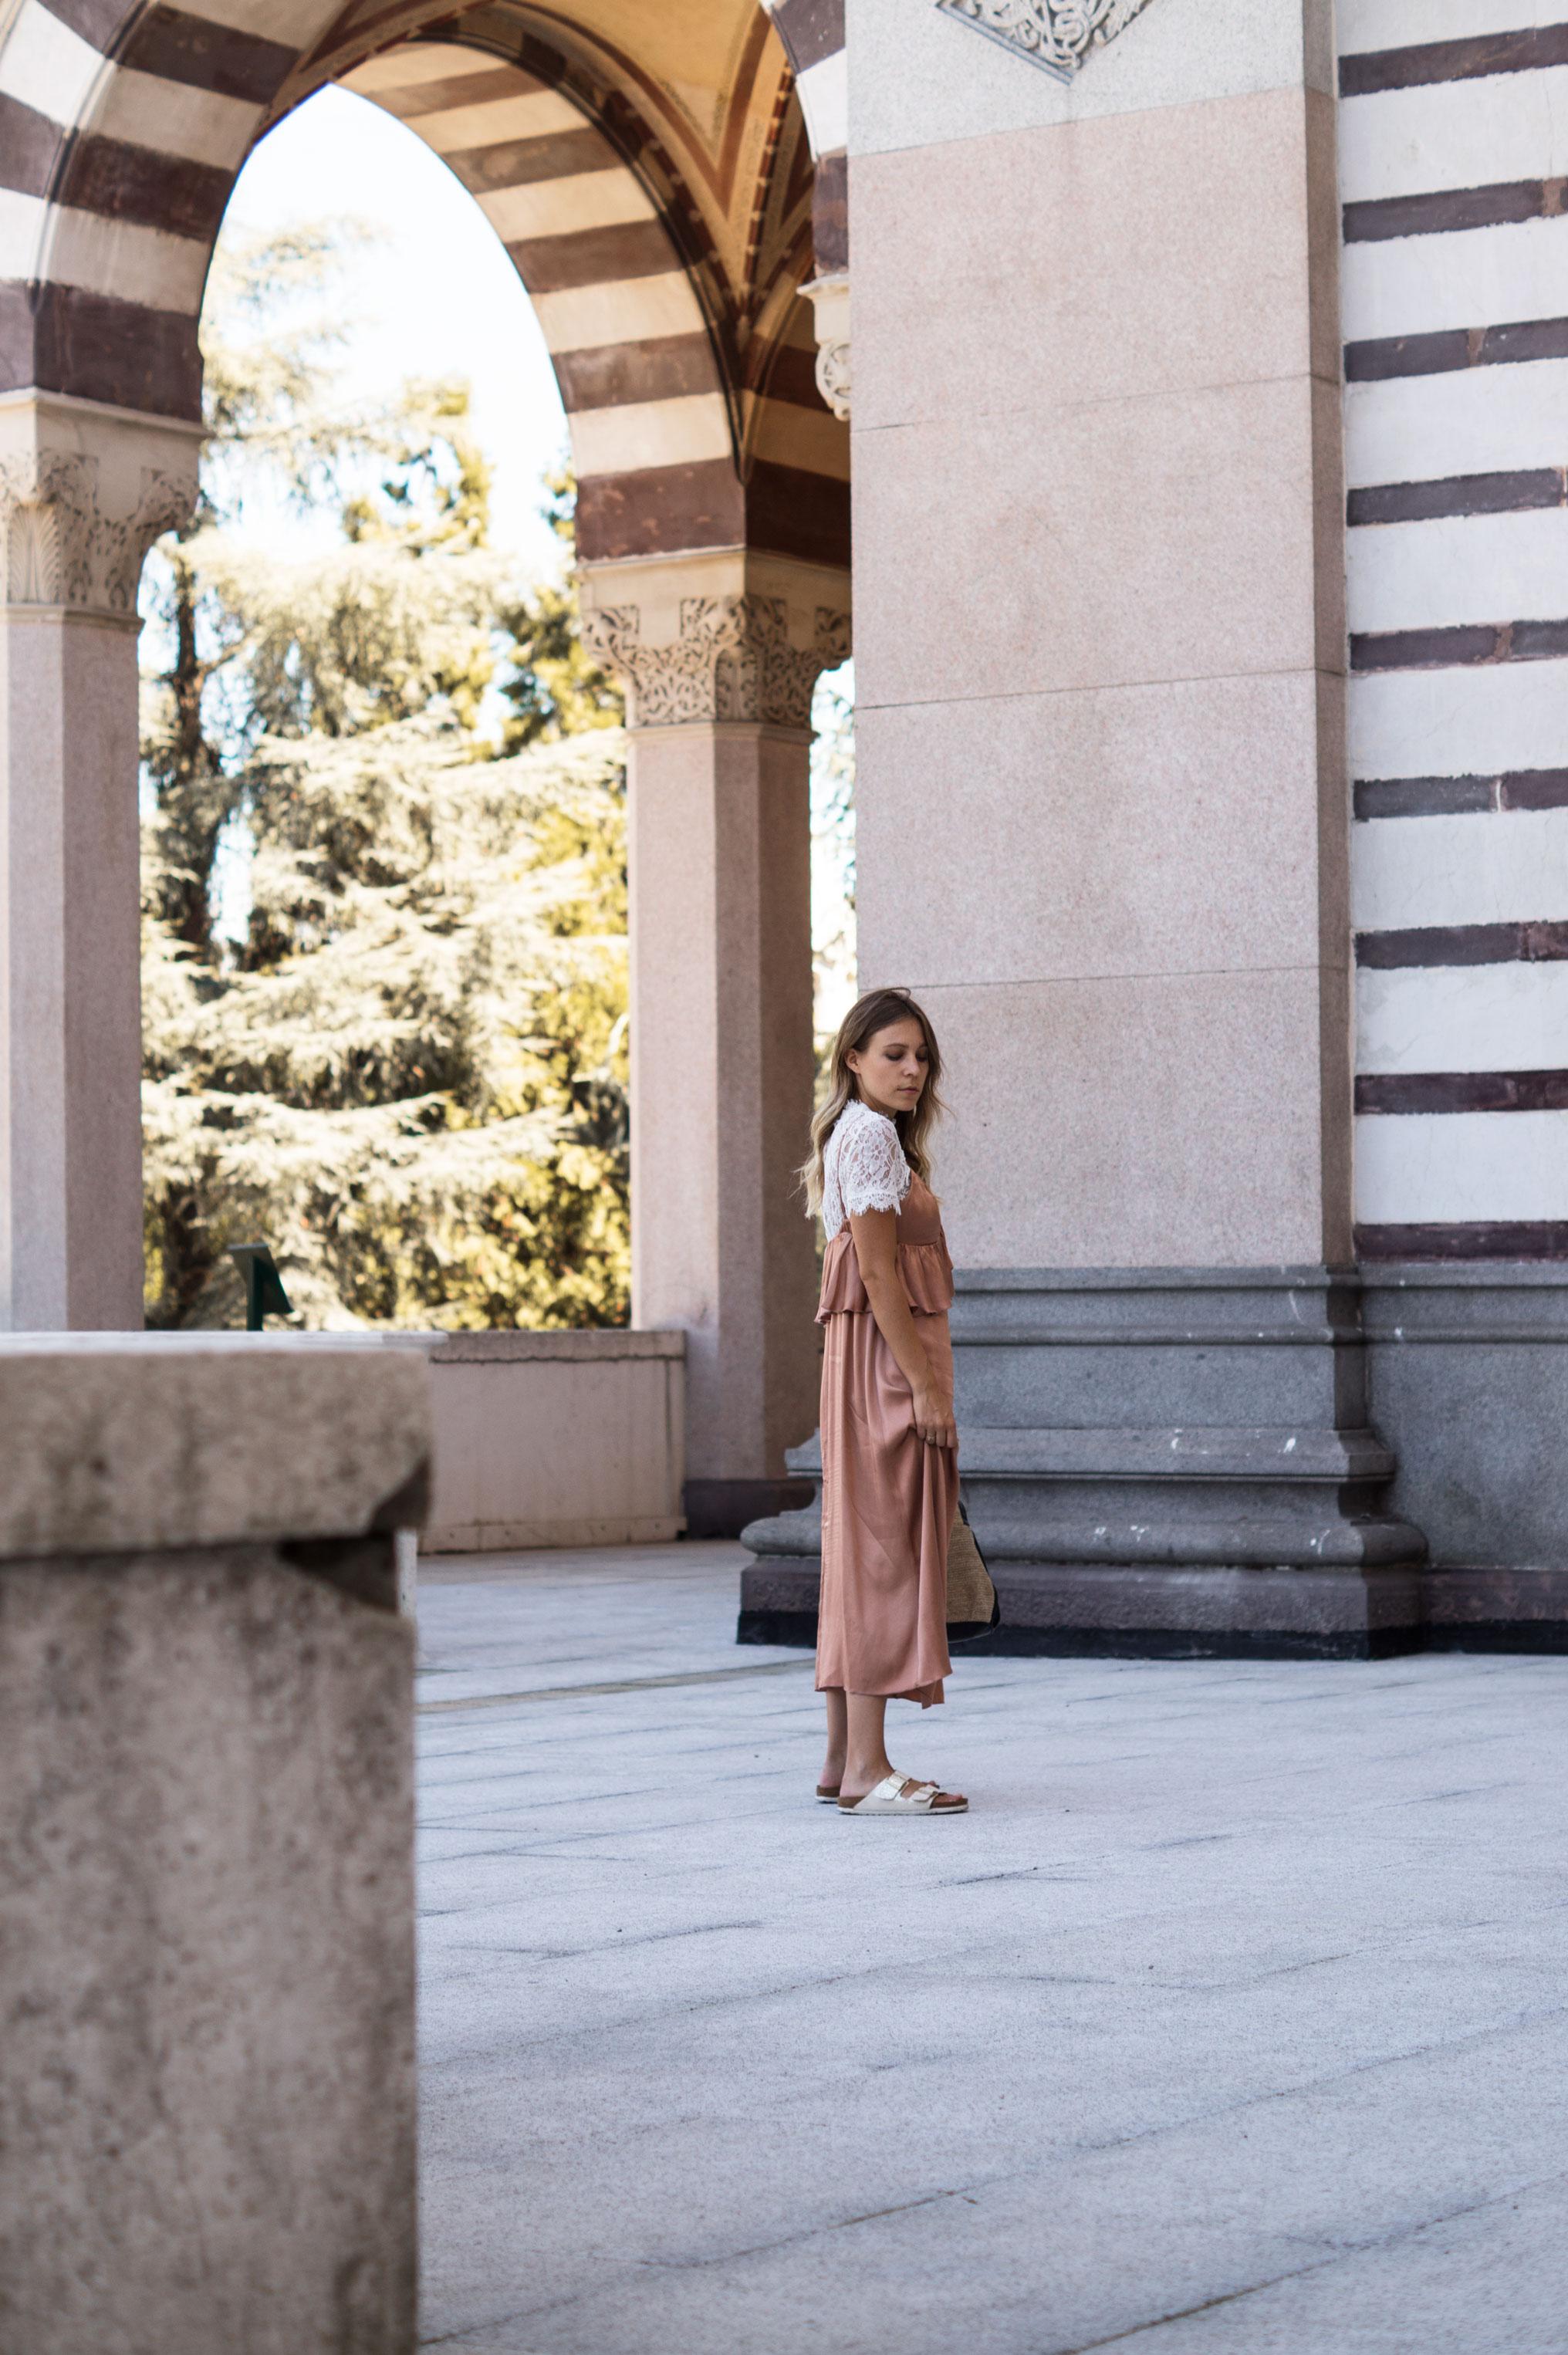 Copper Slipdress rosa Satinkleid silk dress ruffles Rüschenkleid H&M Sariety Modeblog Heidelberg Fashionblogger Milan Mailand Shooting-19